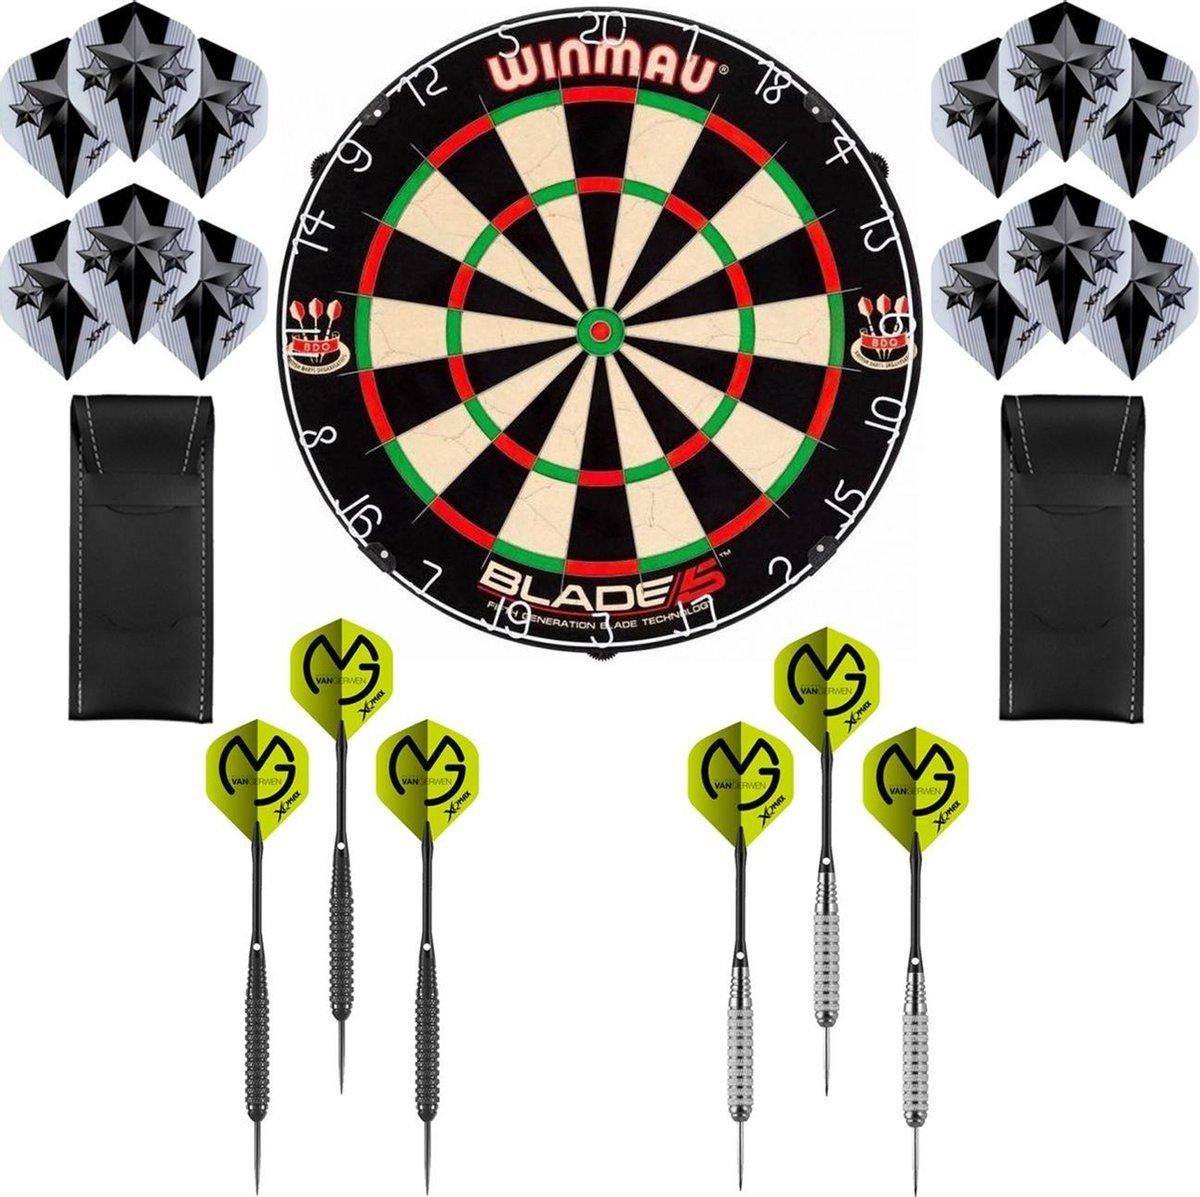 Dragon Darts Michael van Gerwen Precision set - dartbord - 2 sets - dartpijlen - dart shafts - dart flights - Winmau Blade 5 dartbord